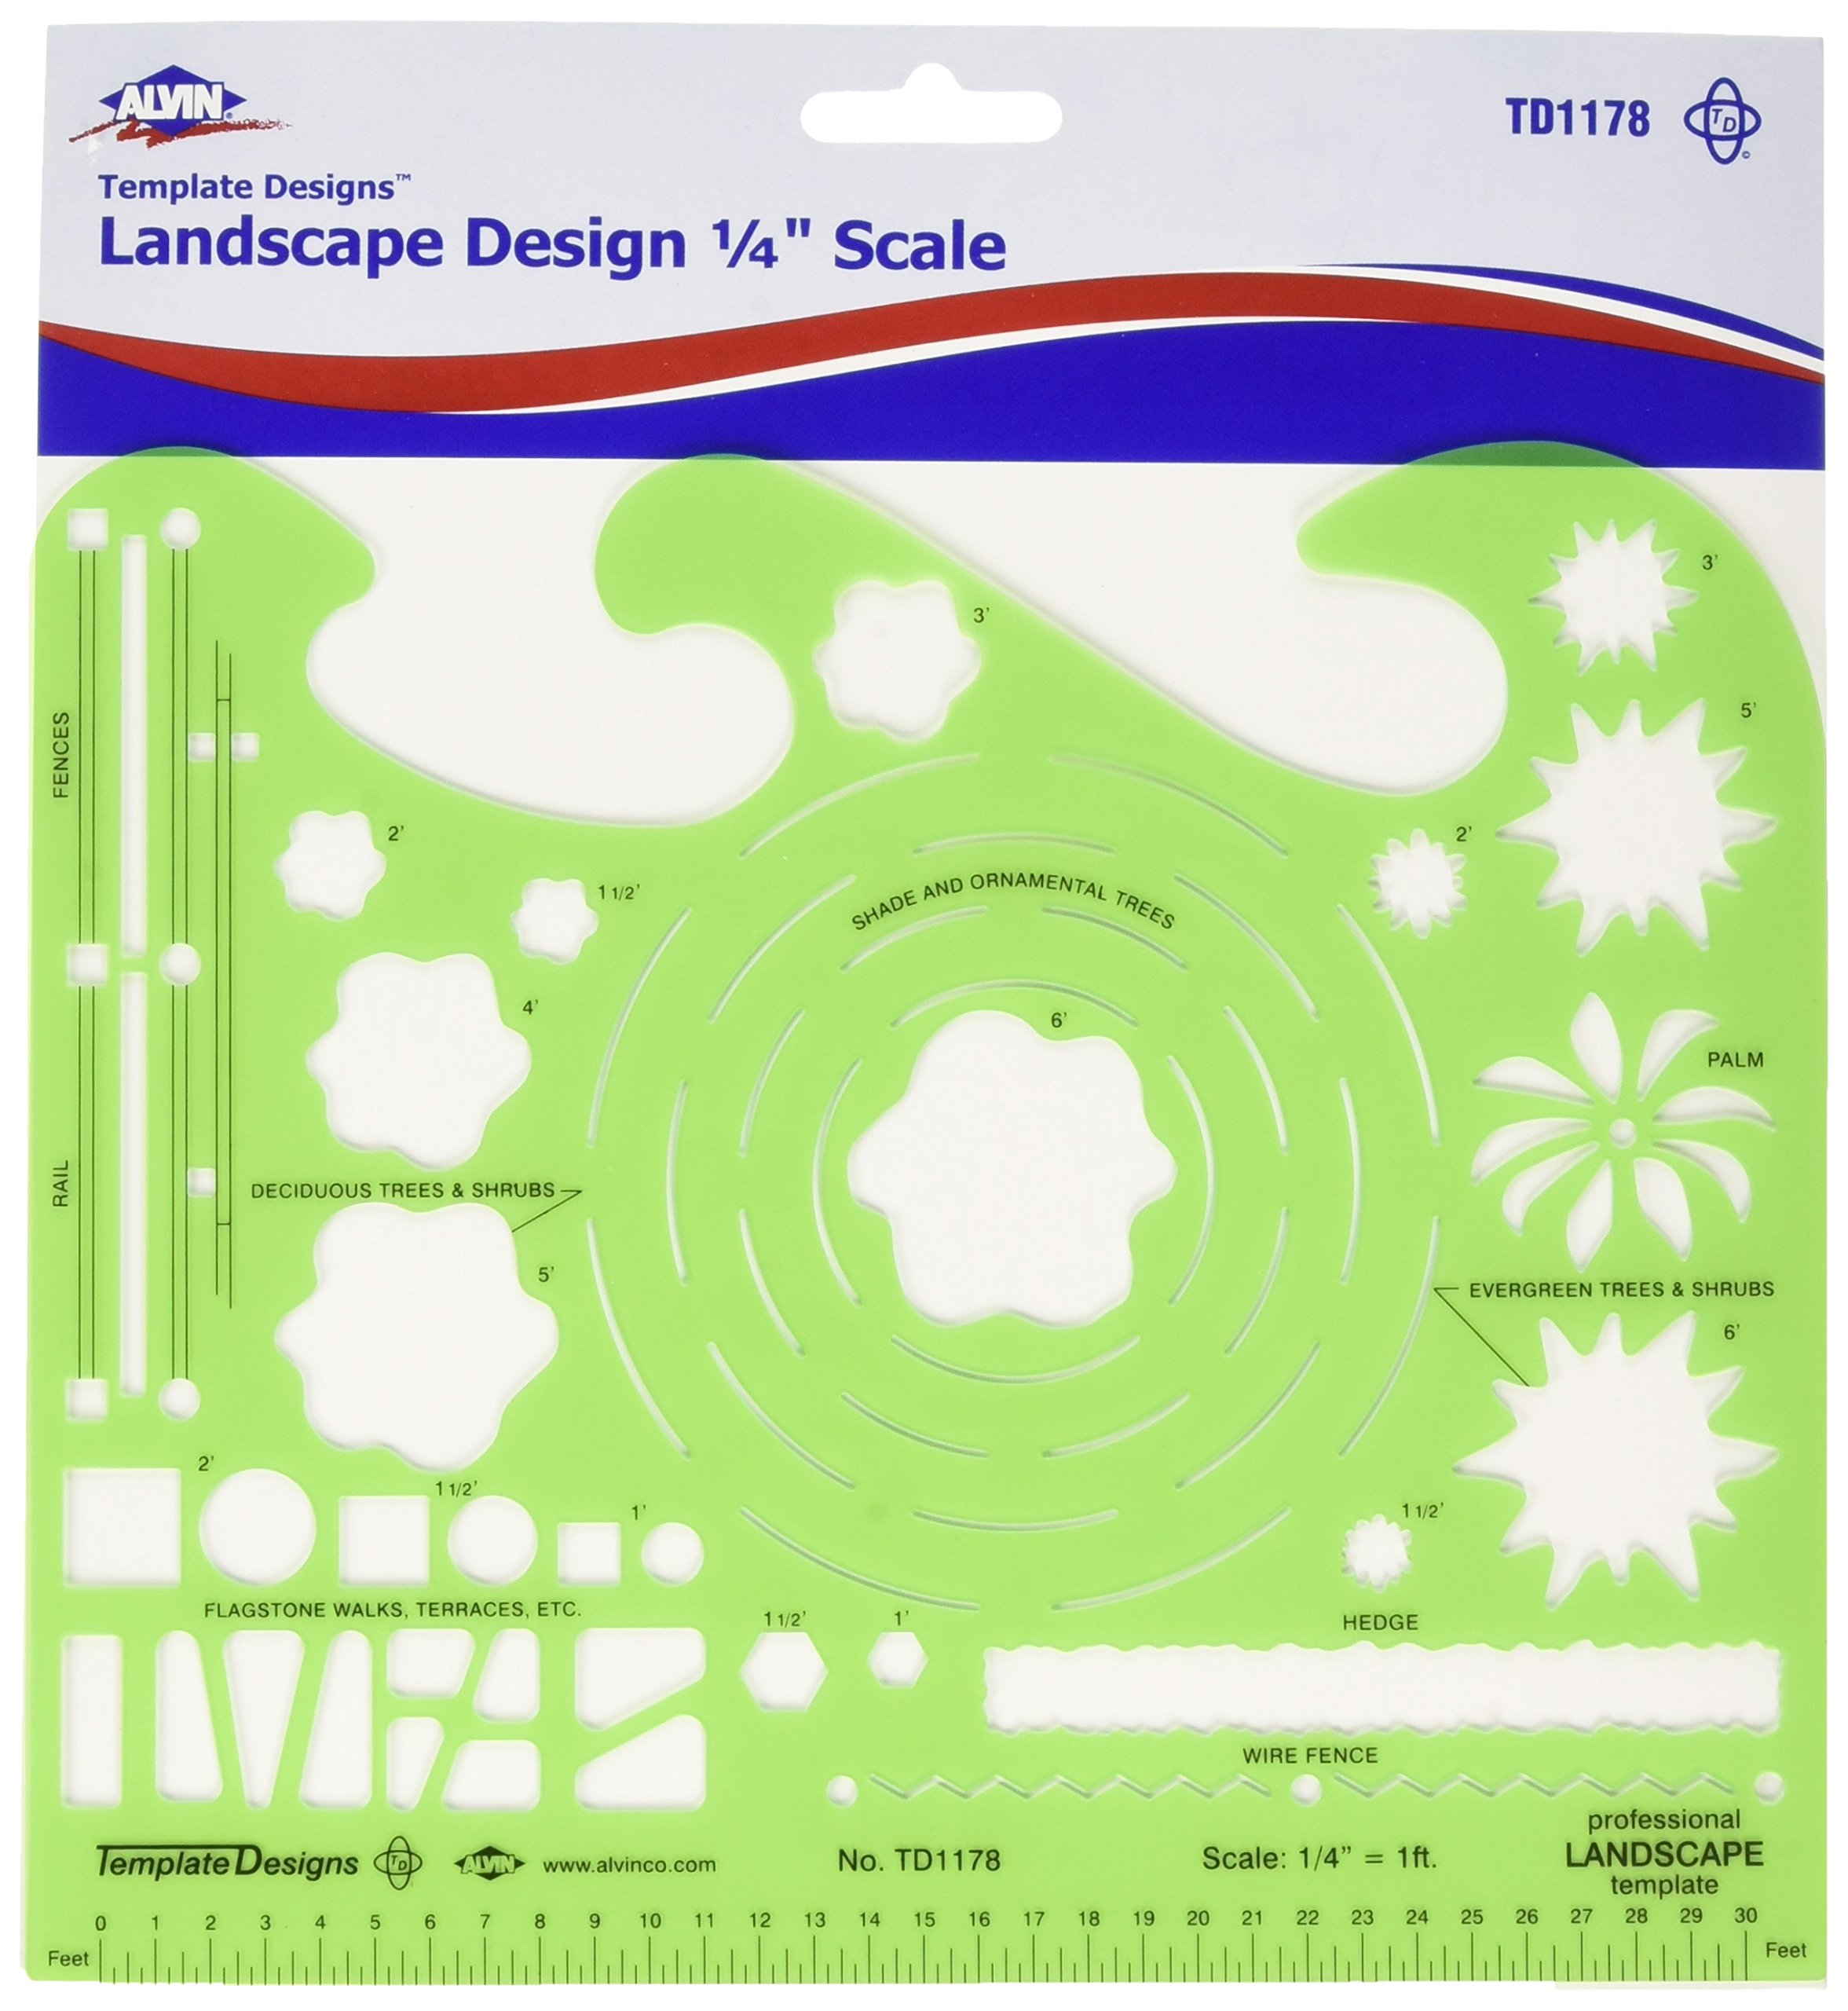 Alvin Professional Landscape Design Template (TD1178) product image